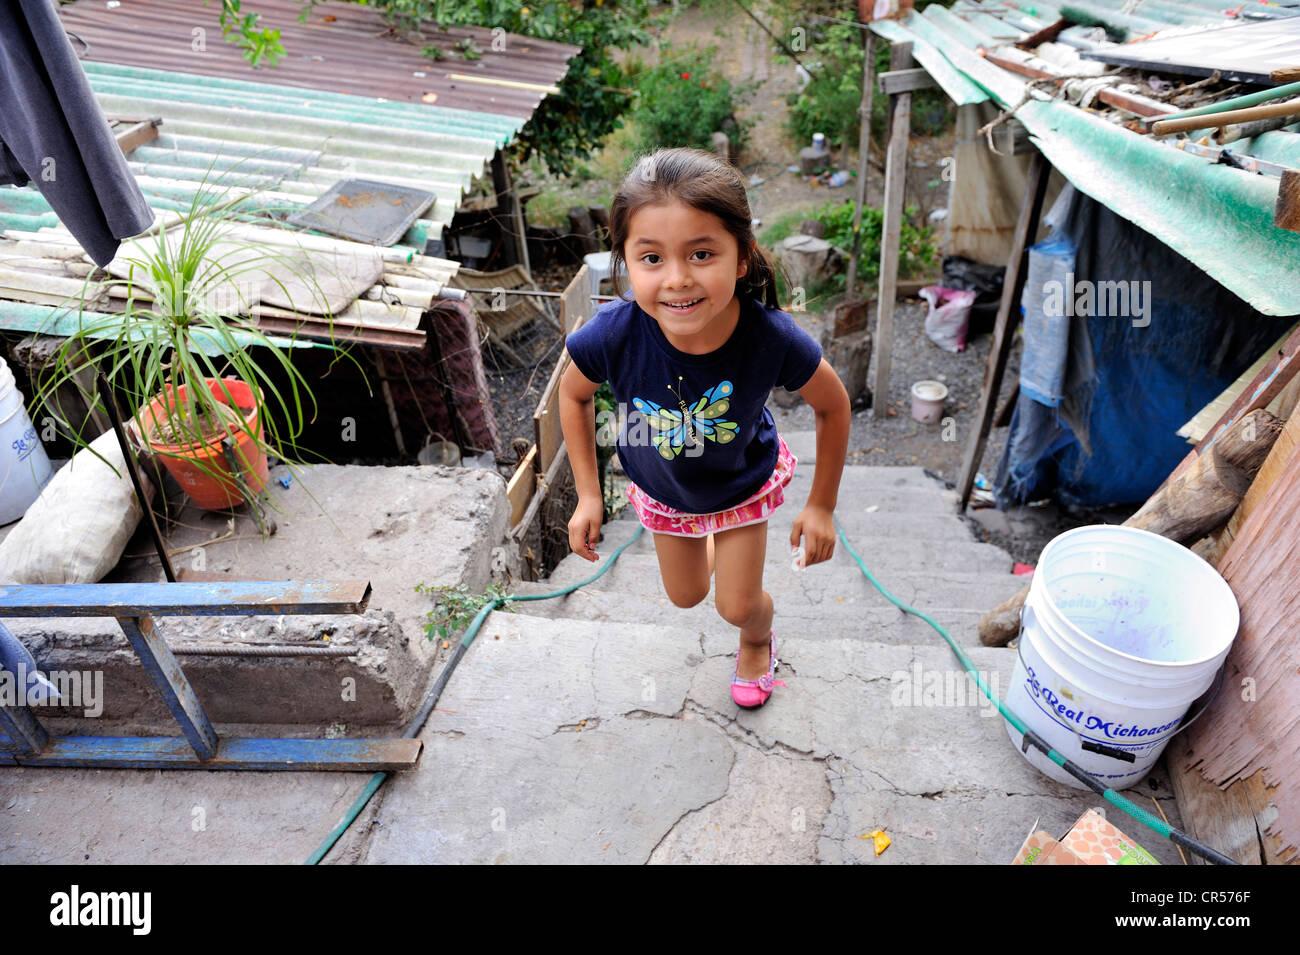 Mädchen in einem Armenviertel, Queretaro, Mexiko, Nordamerika, Lateinamerika Stockbild